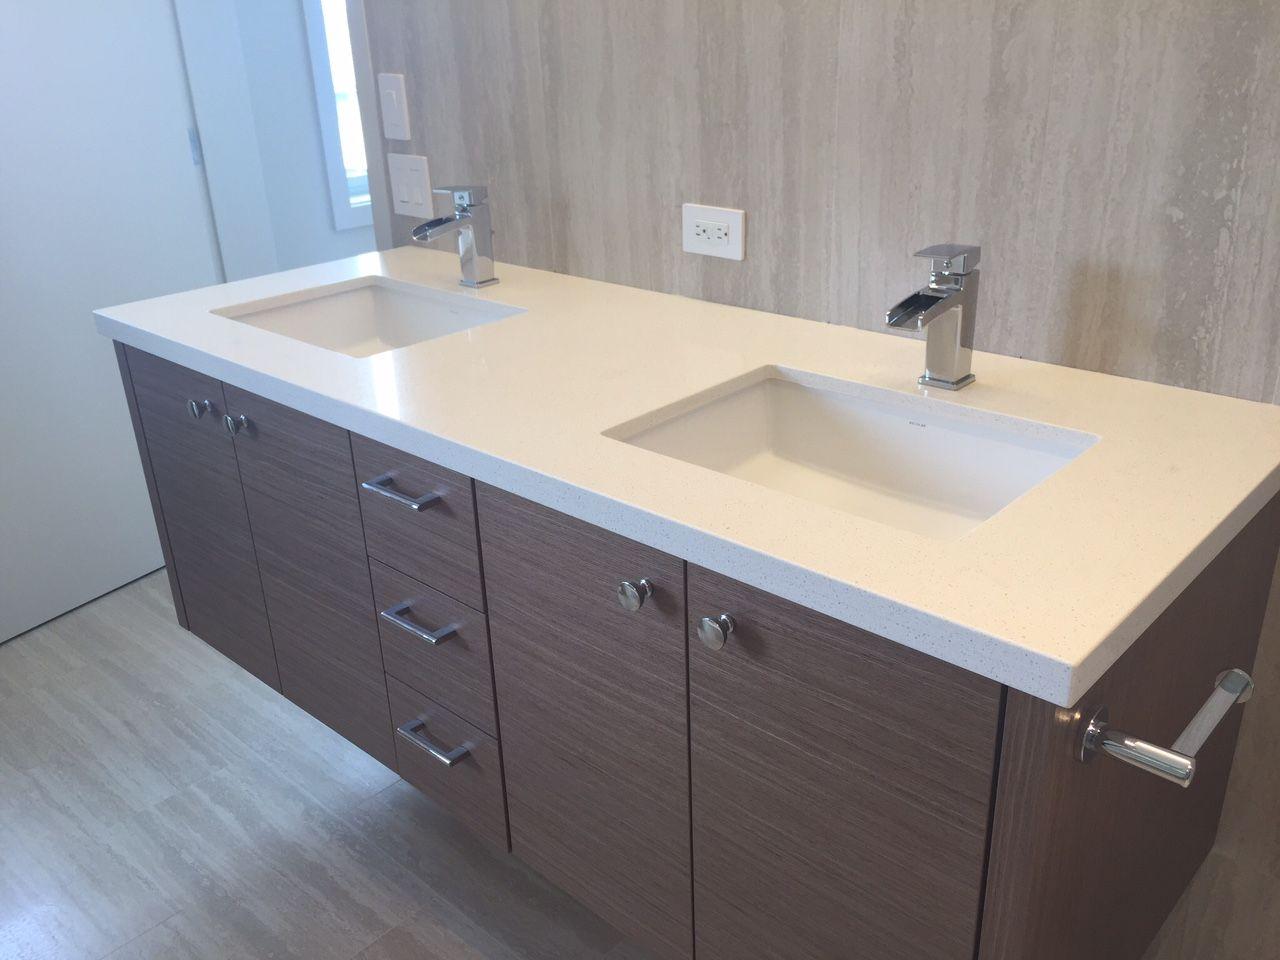 Kitchen Cabinets Hawaii caesarstone bath top with undermount sinks. countertopshawaii